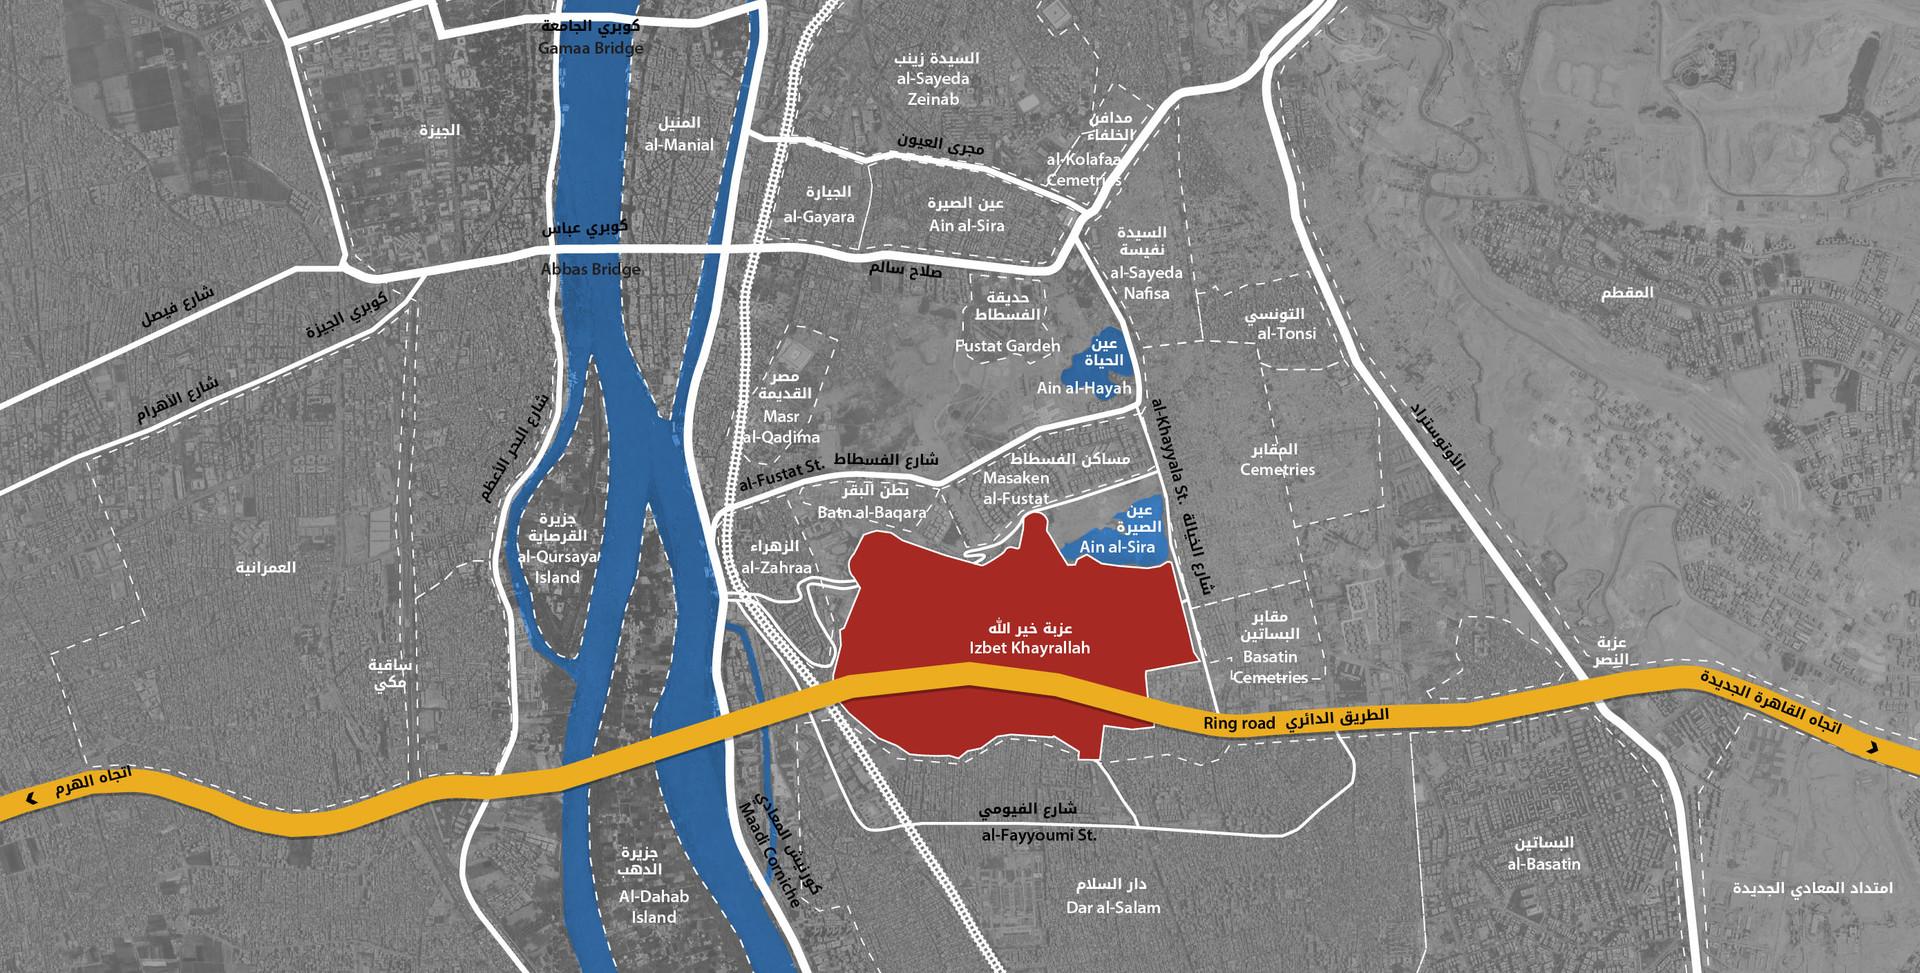 Izbit Khayrallah surrounding neighbourhoods